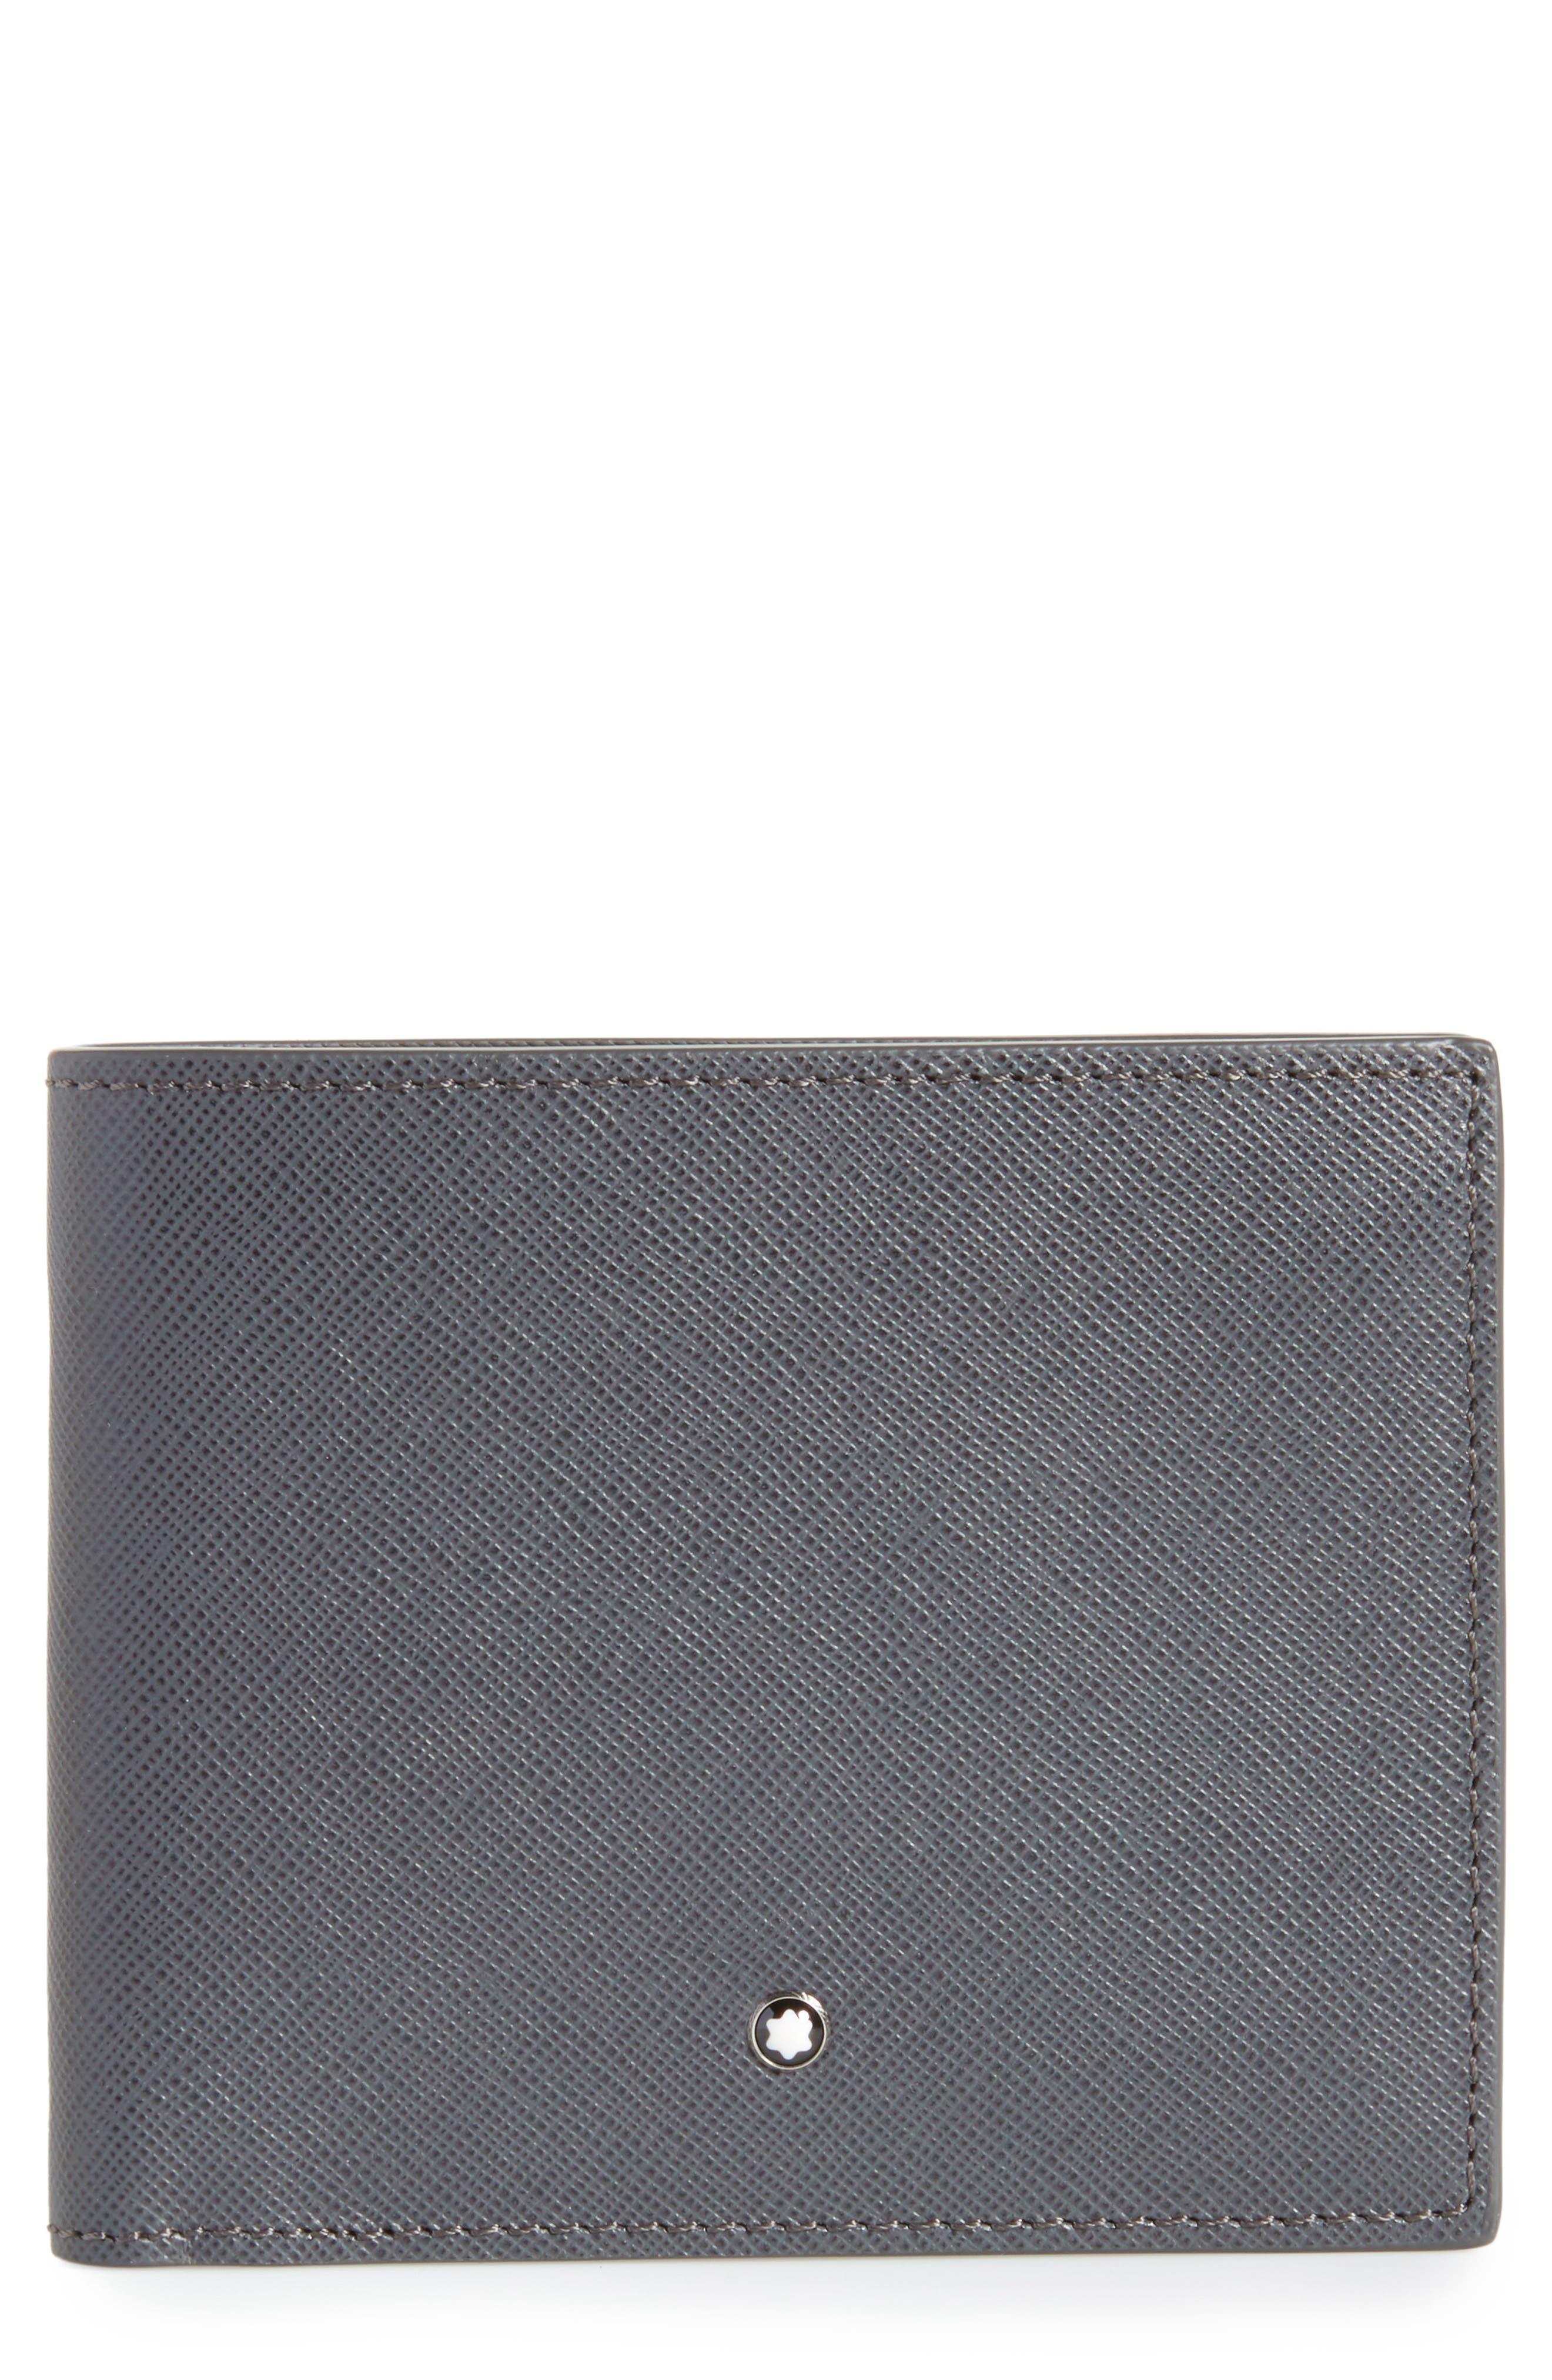 Sartorial Leather Bifold Wallet,                         Main,                         color, Dark Grey